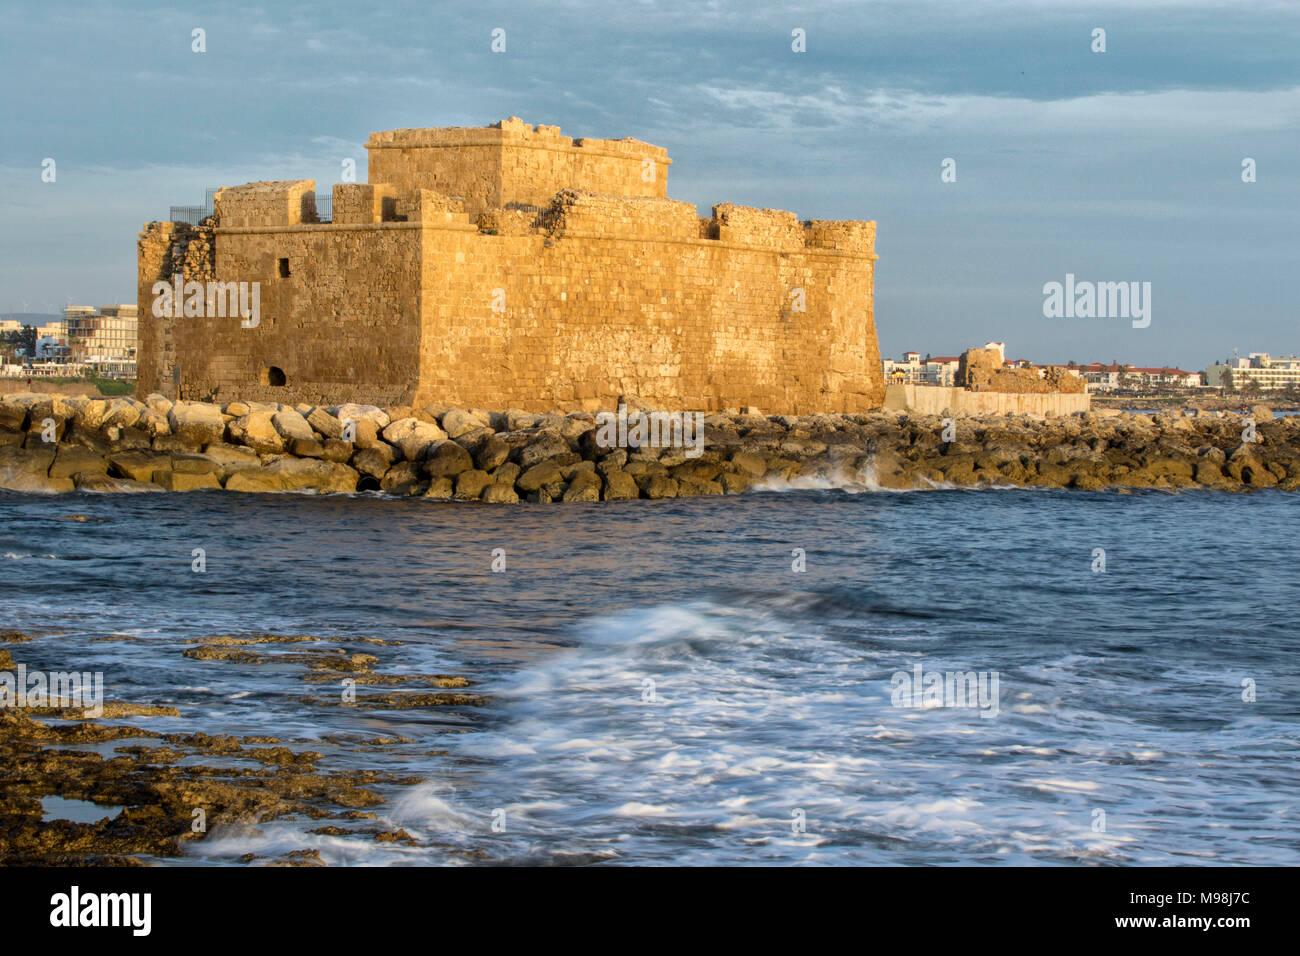 Paphos castle / fort in kato paphos harbour on the mediterranean coast of paphos, cyprus, mediterranean, europe Stock Photo